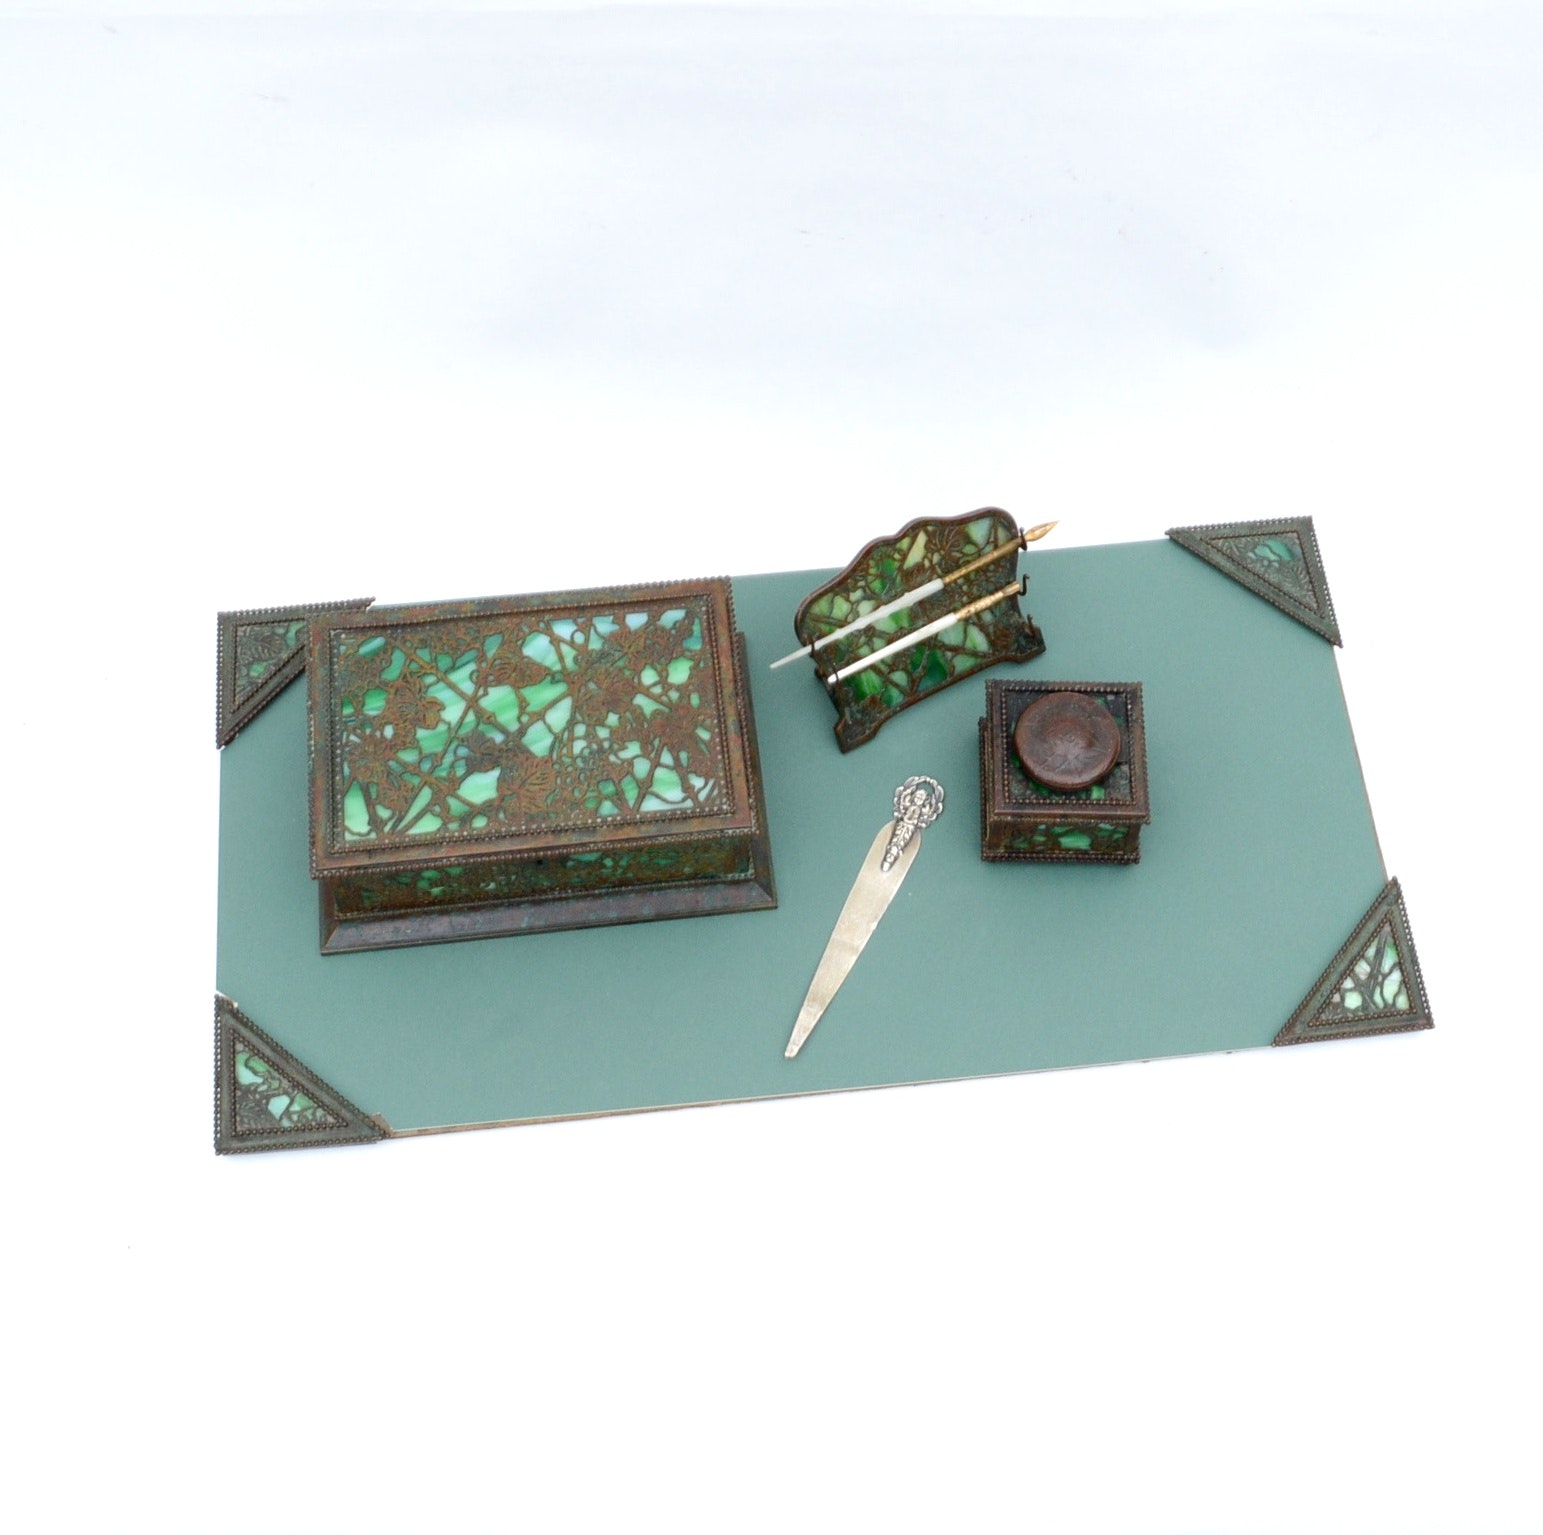 Tiffany Studios Glass and Bronze Desk Set